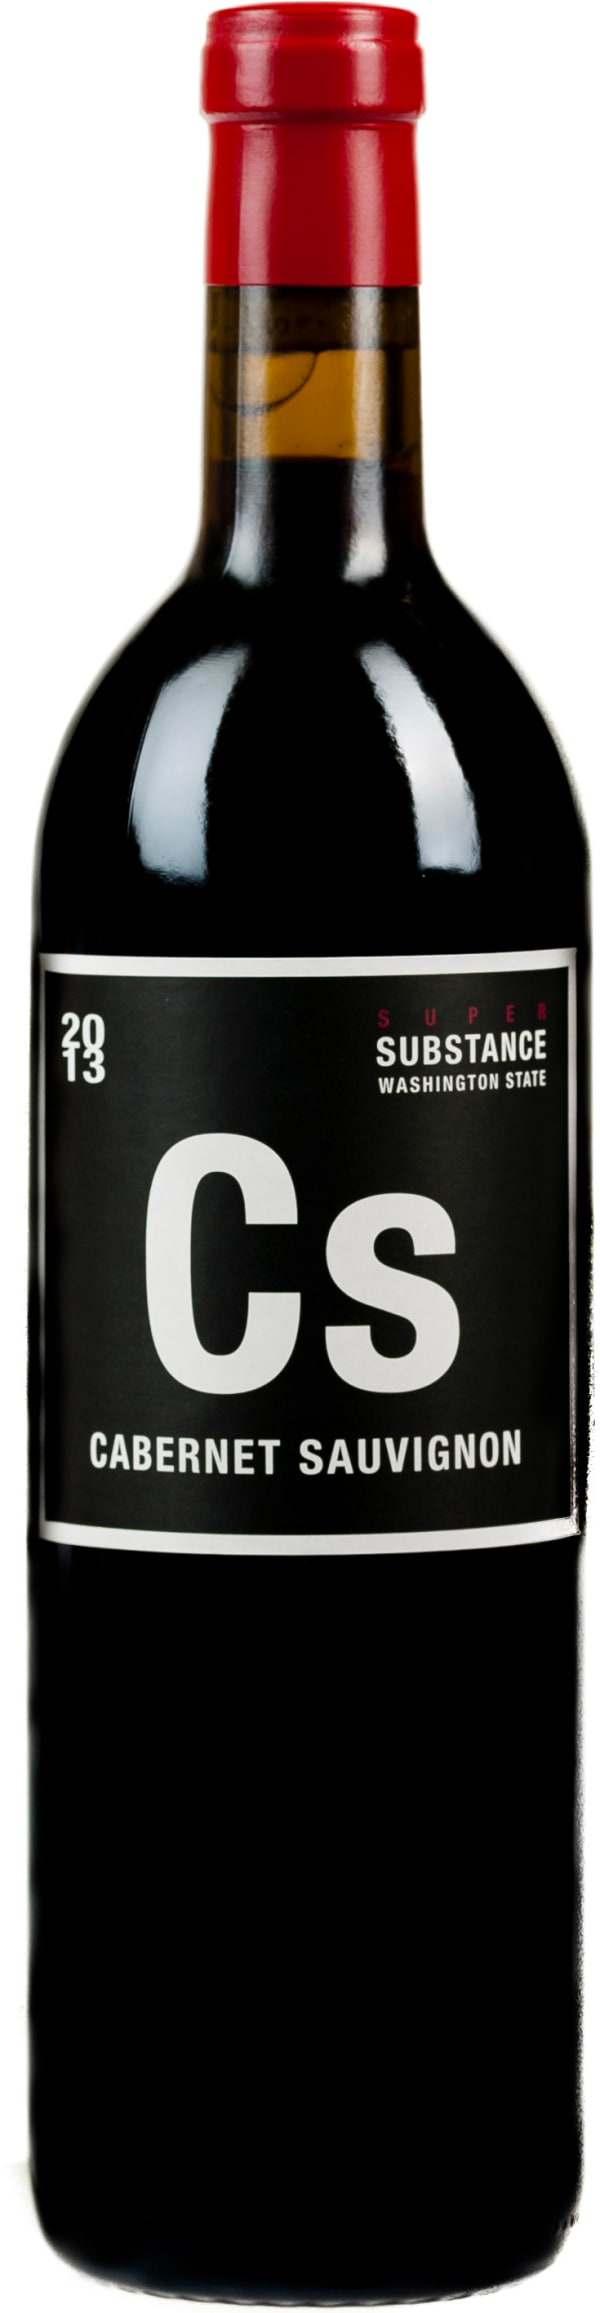 Wines of Substance Super Substance Stoneridge Vineyard Cabernet Sauvignon 2013